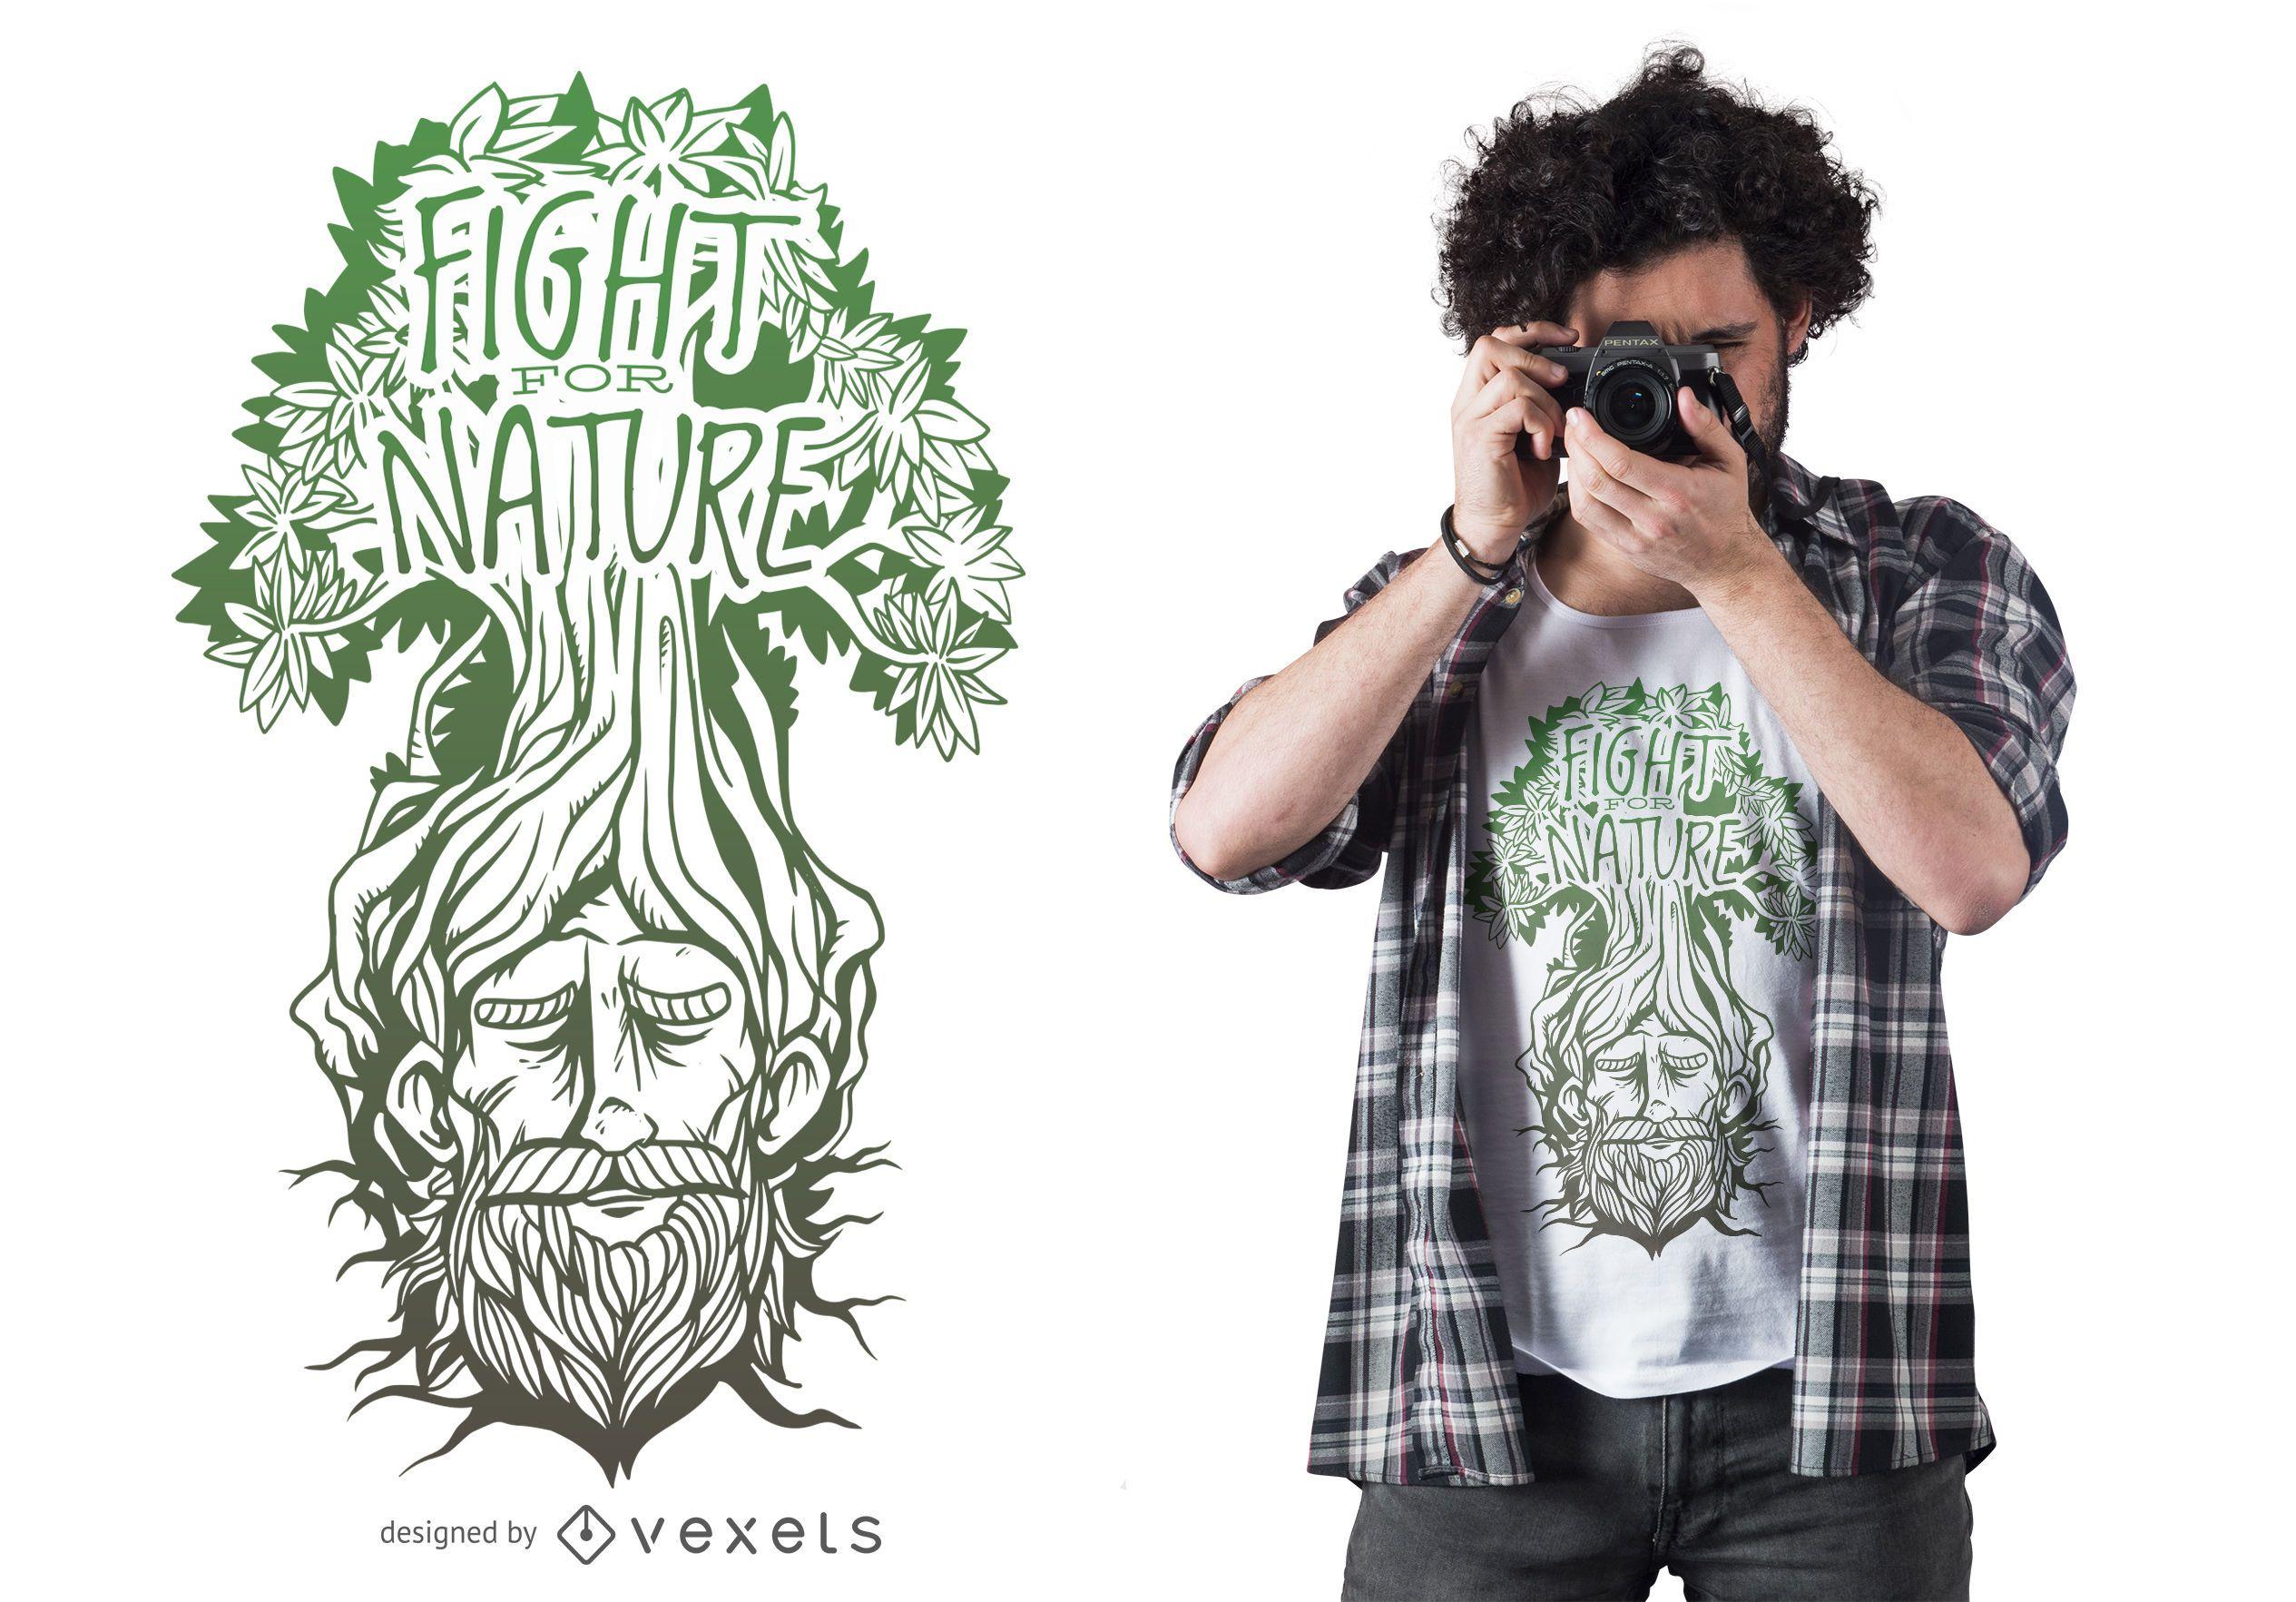 Fight nature t-shirt design